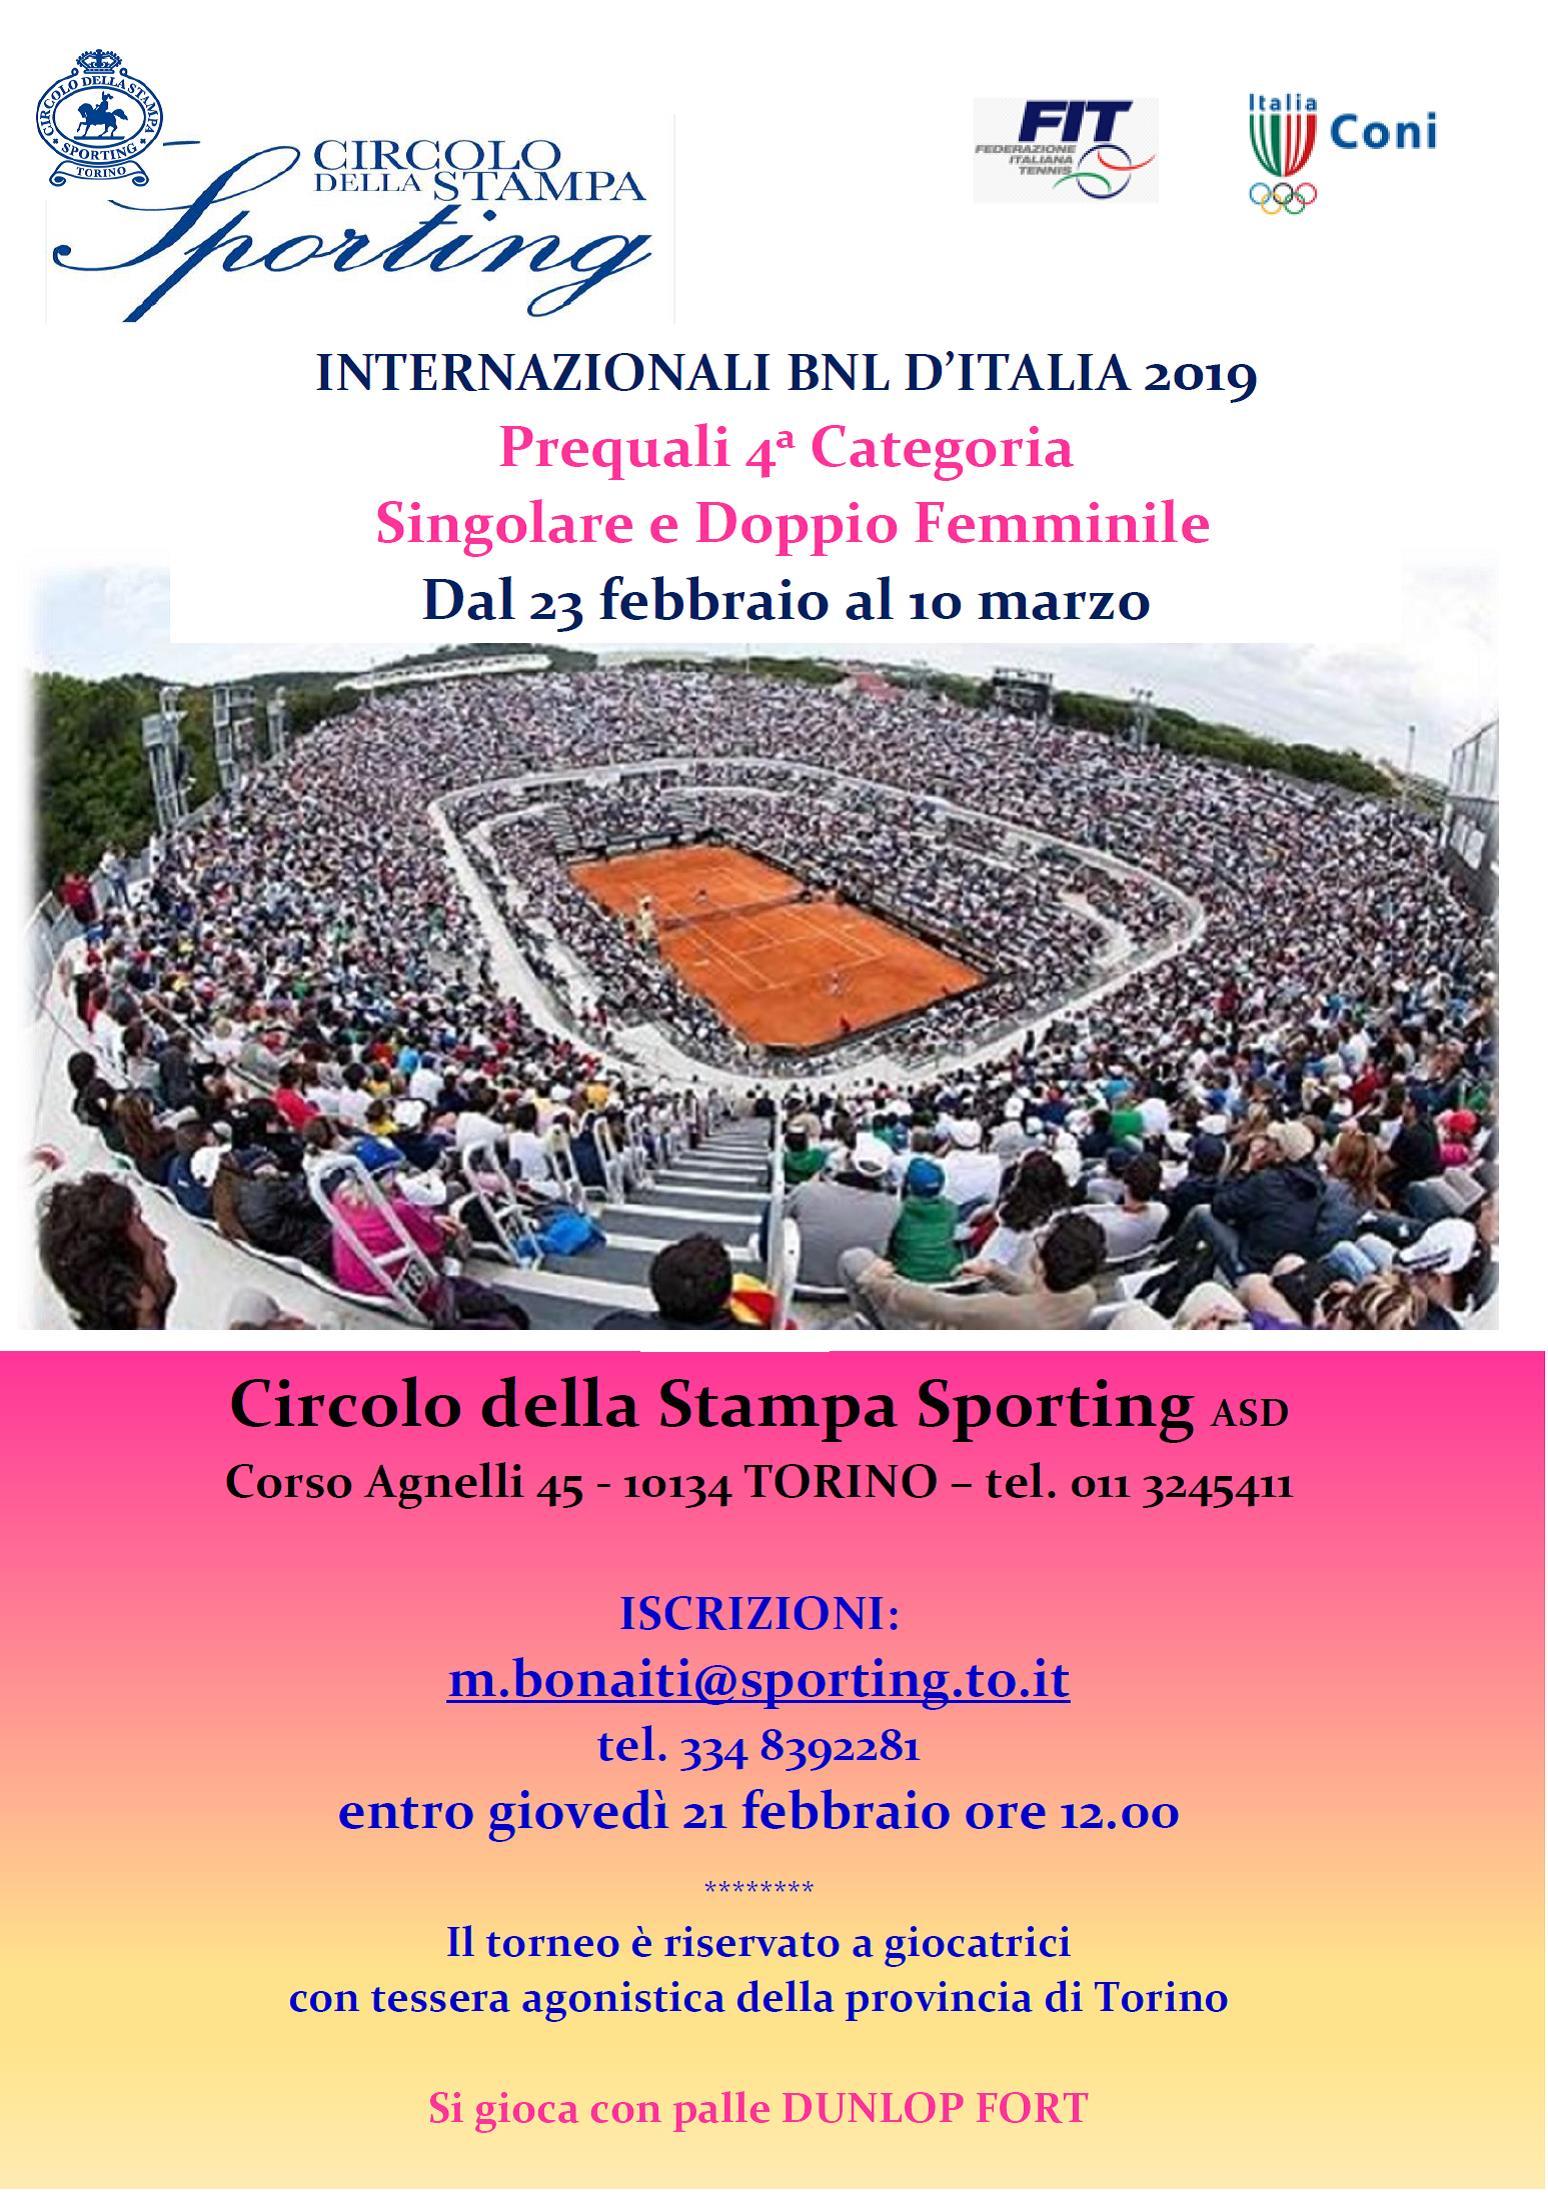 PREQUALI BNL 2019 4^ CAT. FEMMINILE TORINO